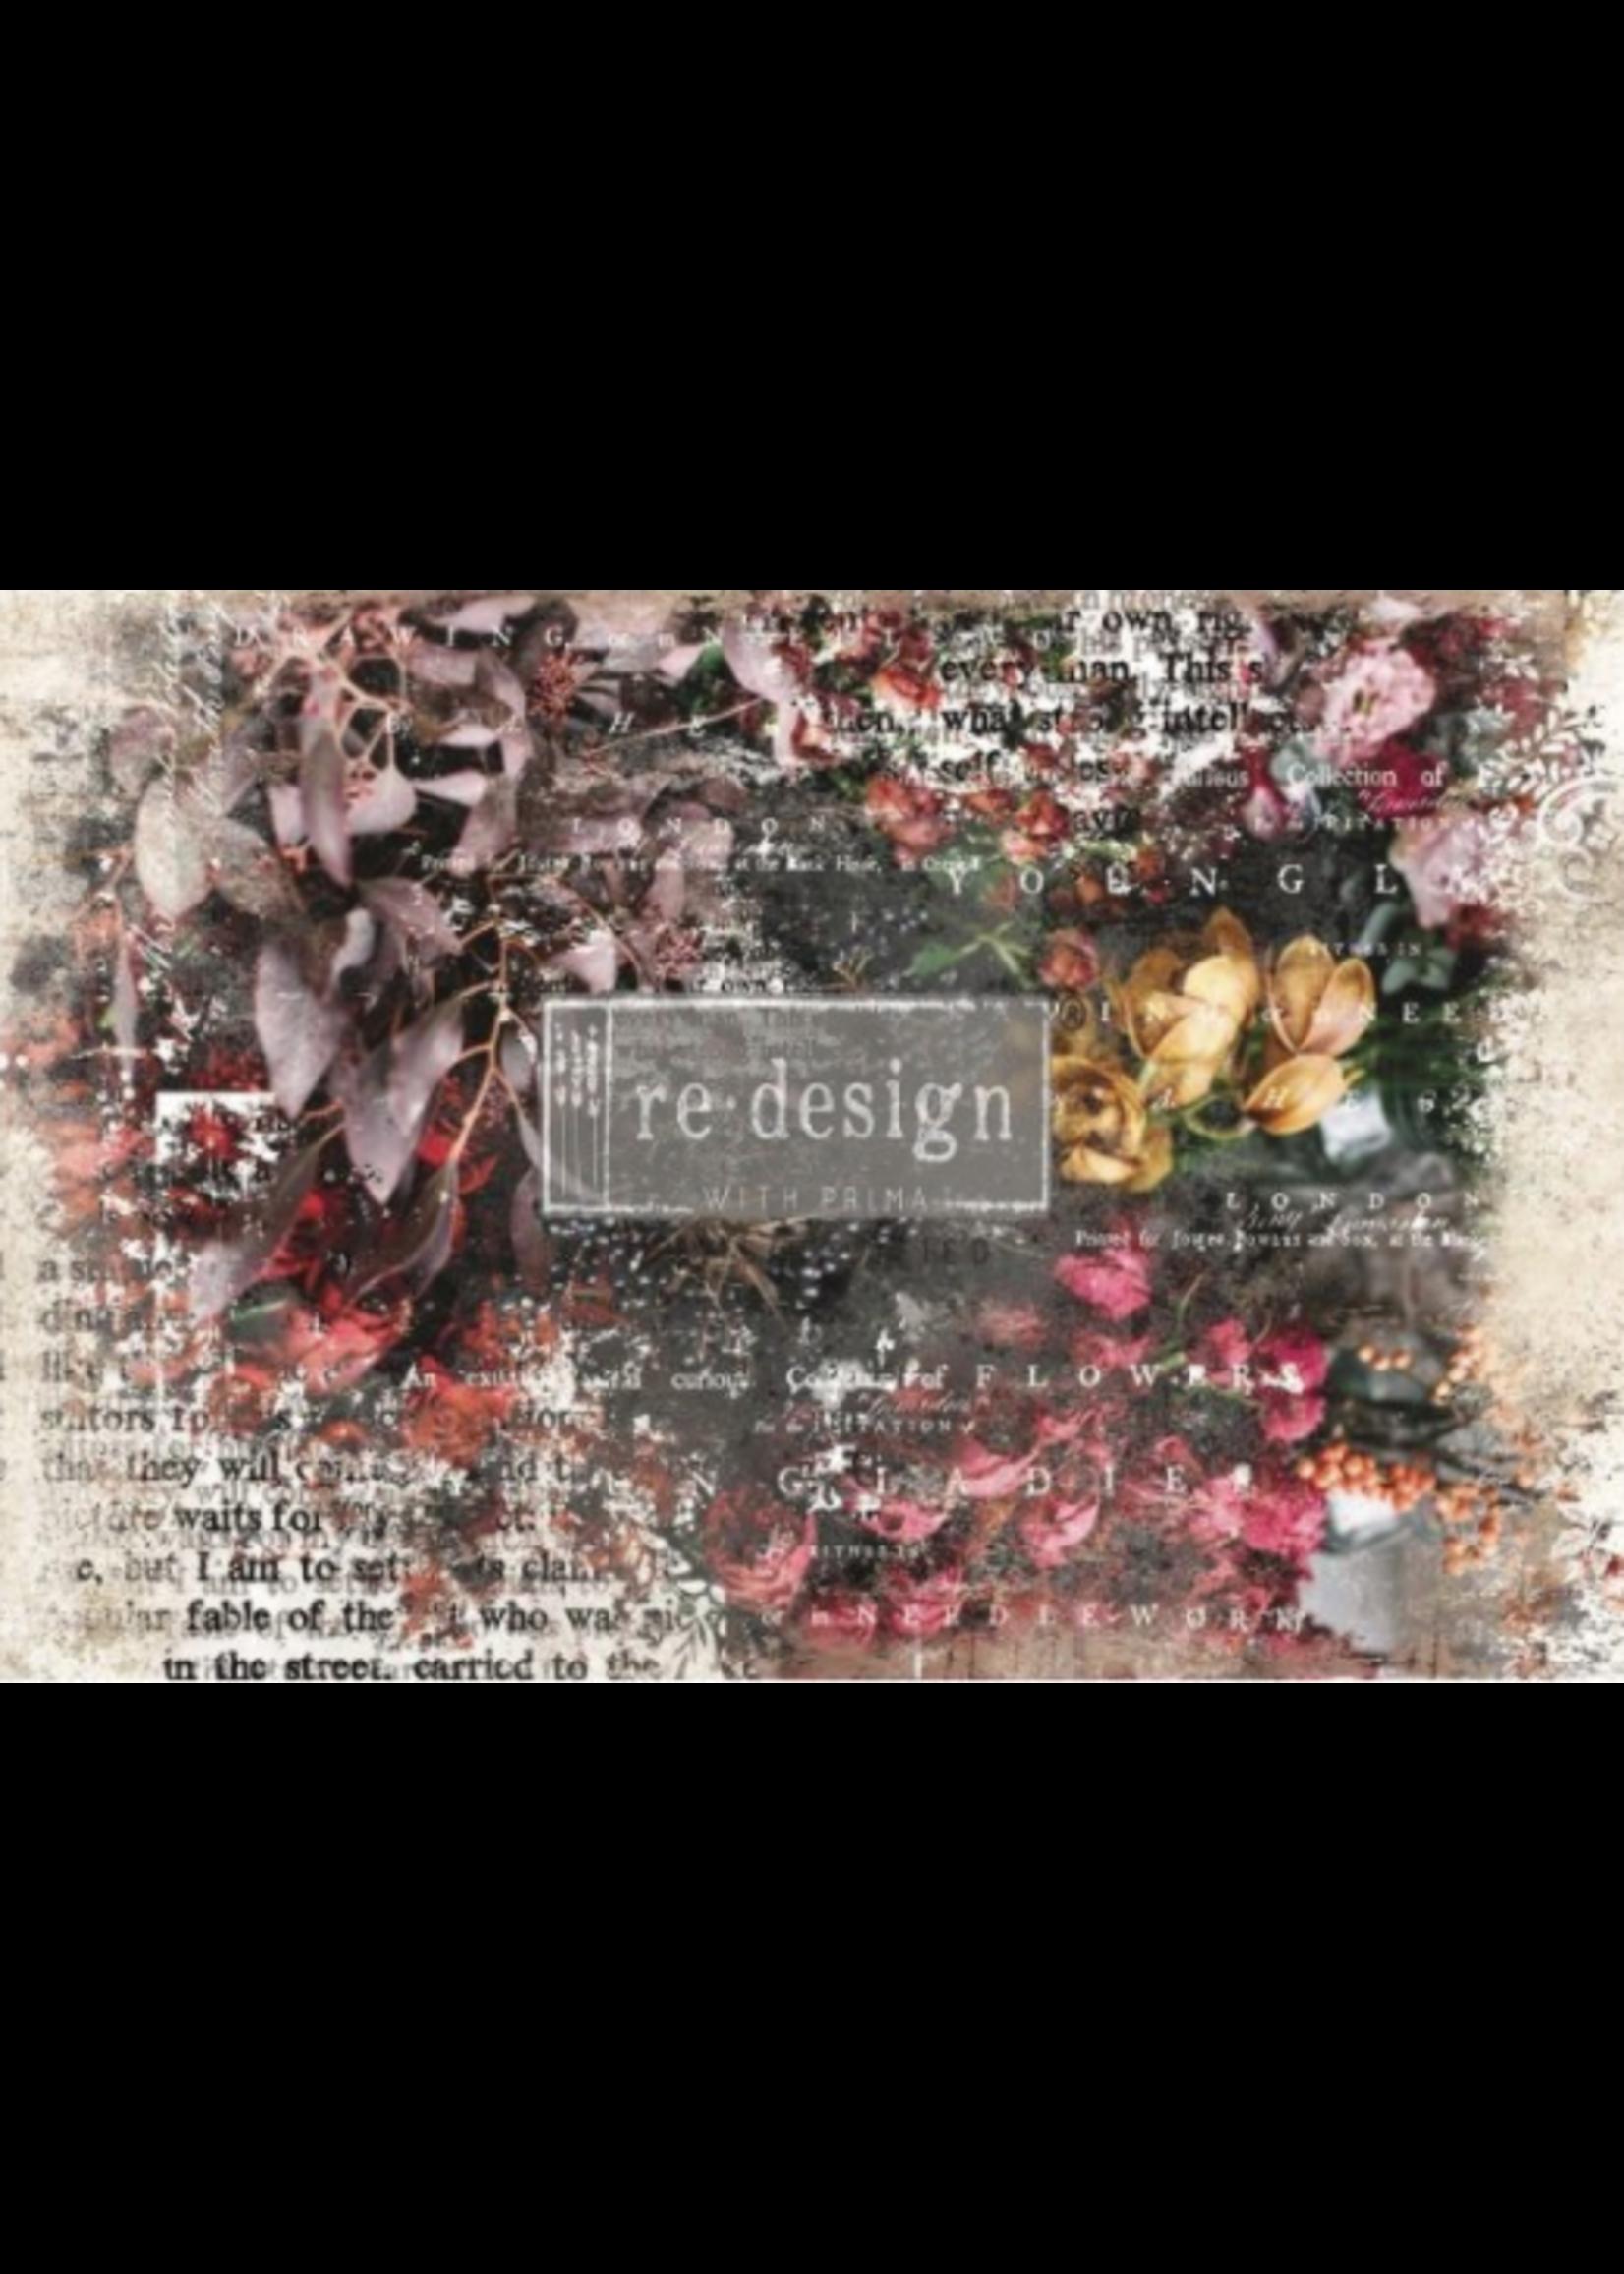 Re-Design with Prima® Iva Re·Design with Prima® Decoupage Tissue Paper